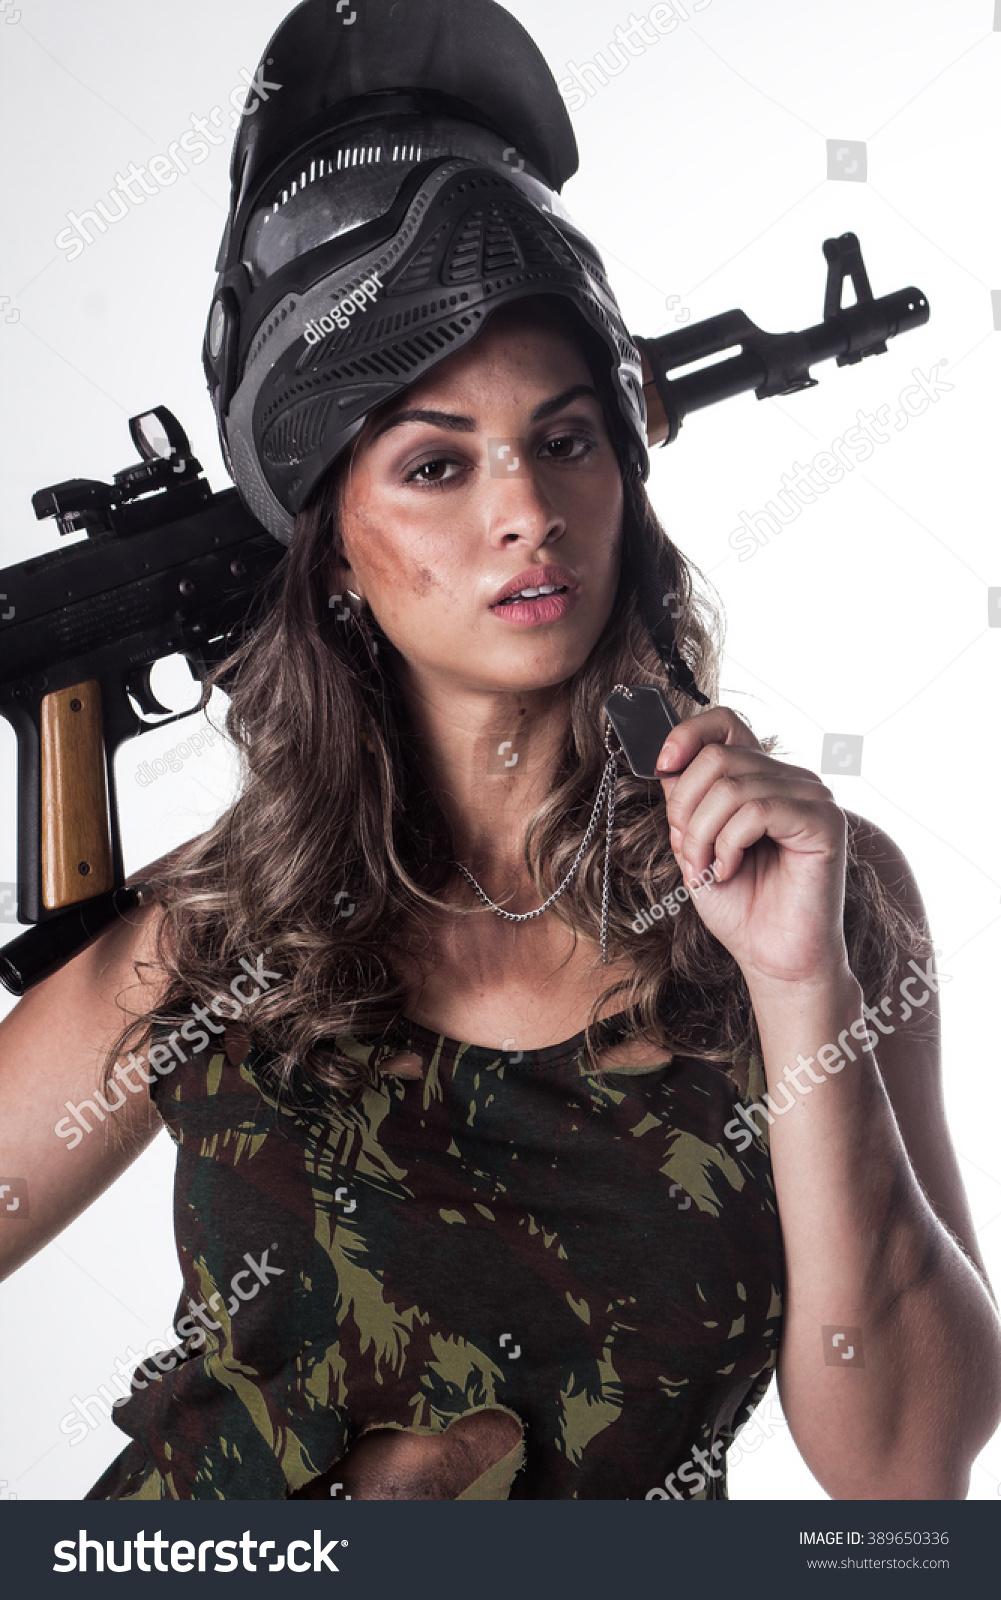 Photography women in brazil posing with guns foto 569